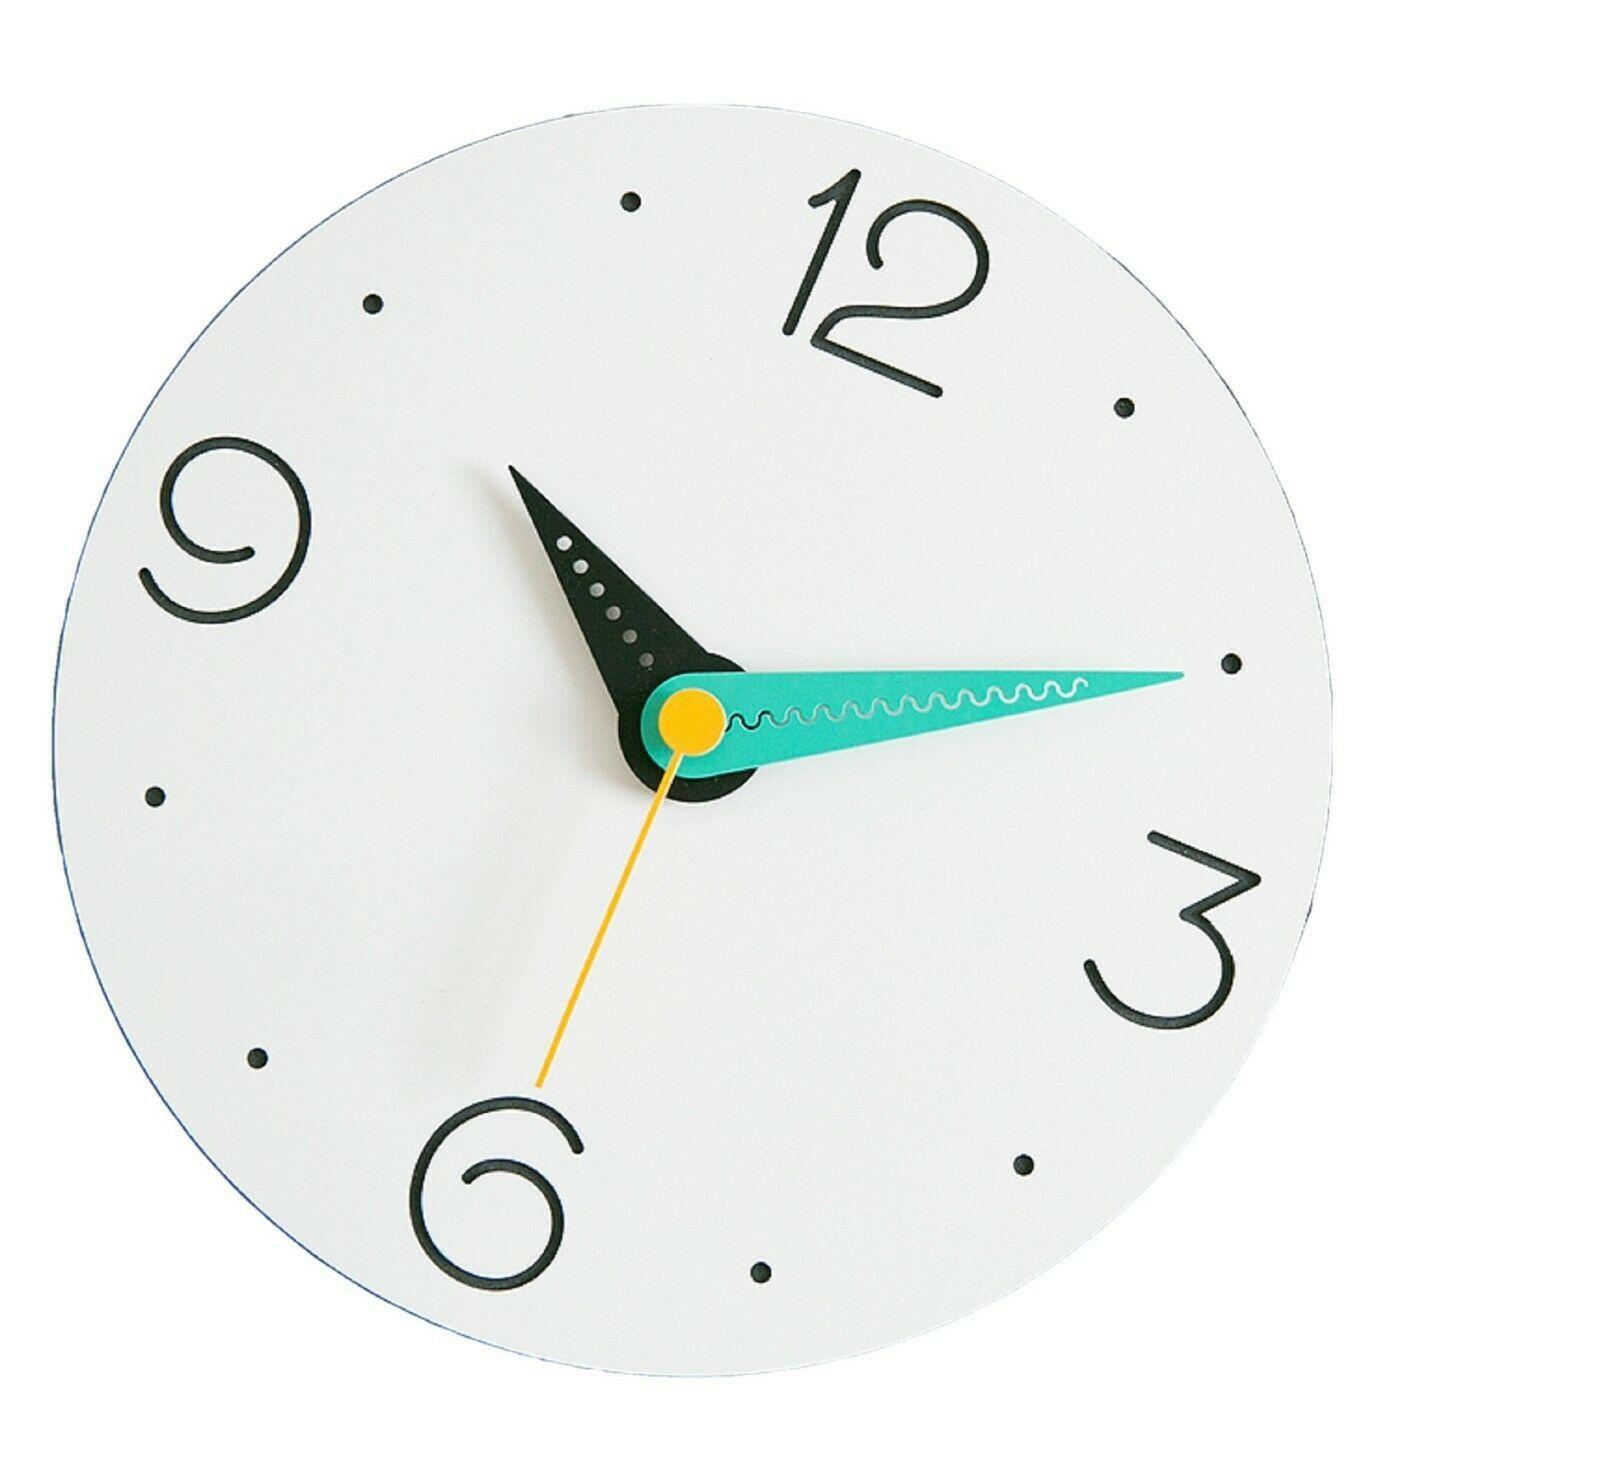 Moro Design Point Line Wall Clock non Ticking Silent Modern Clock (Numeric Mint)